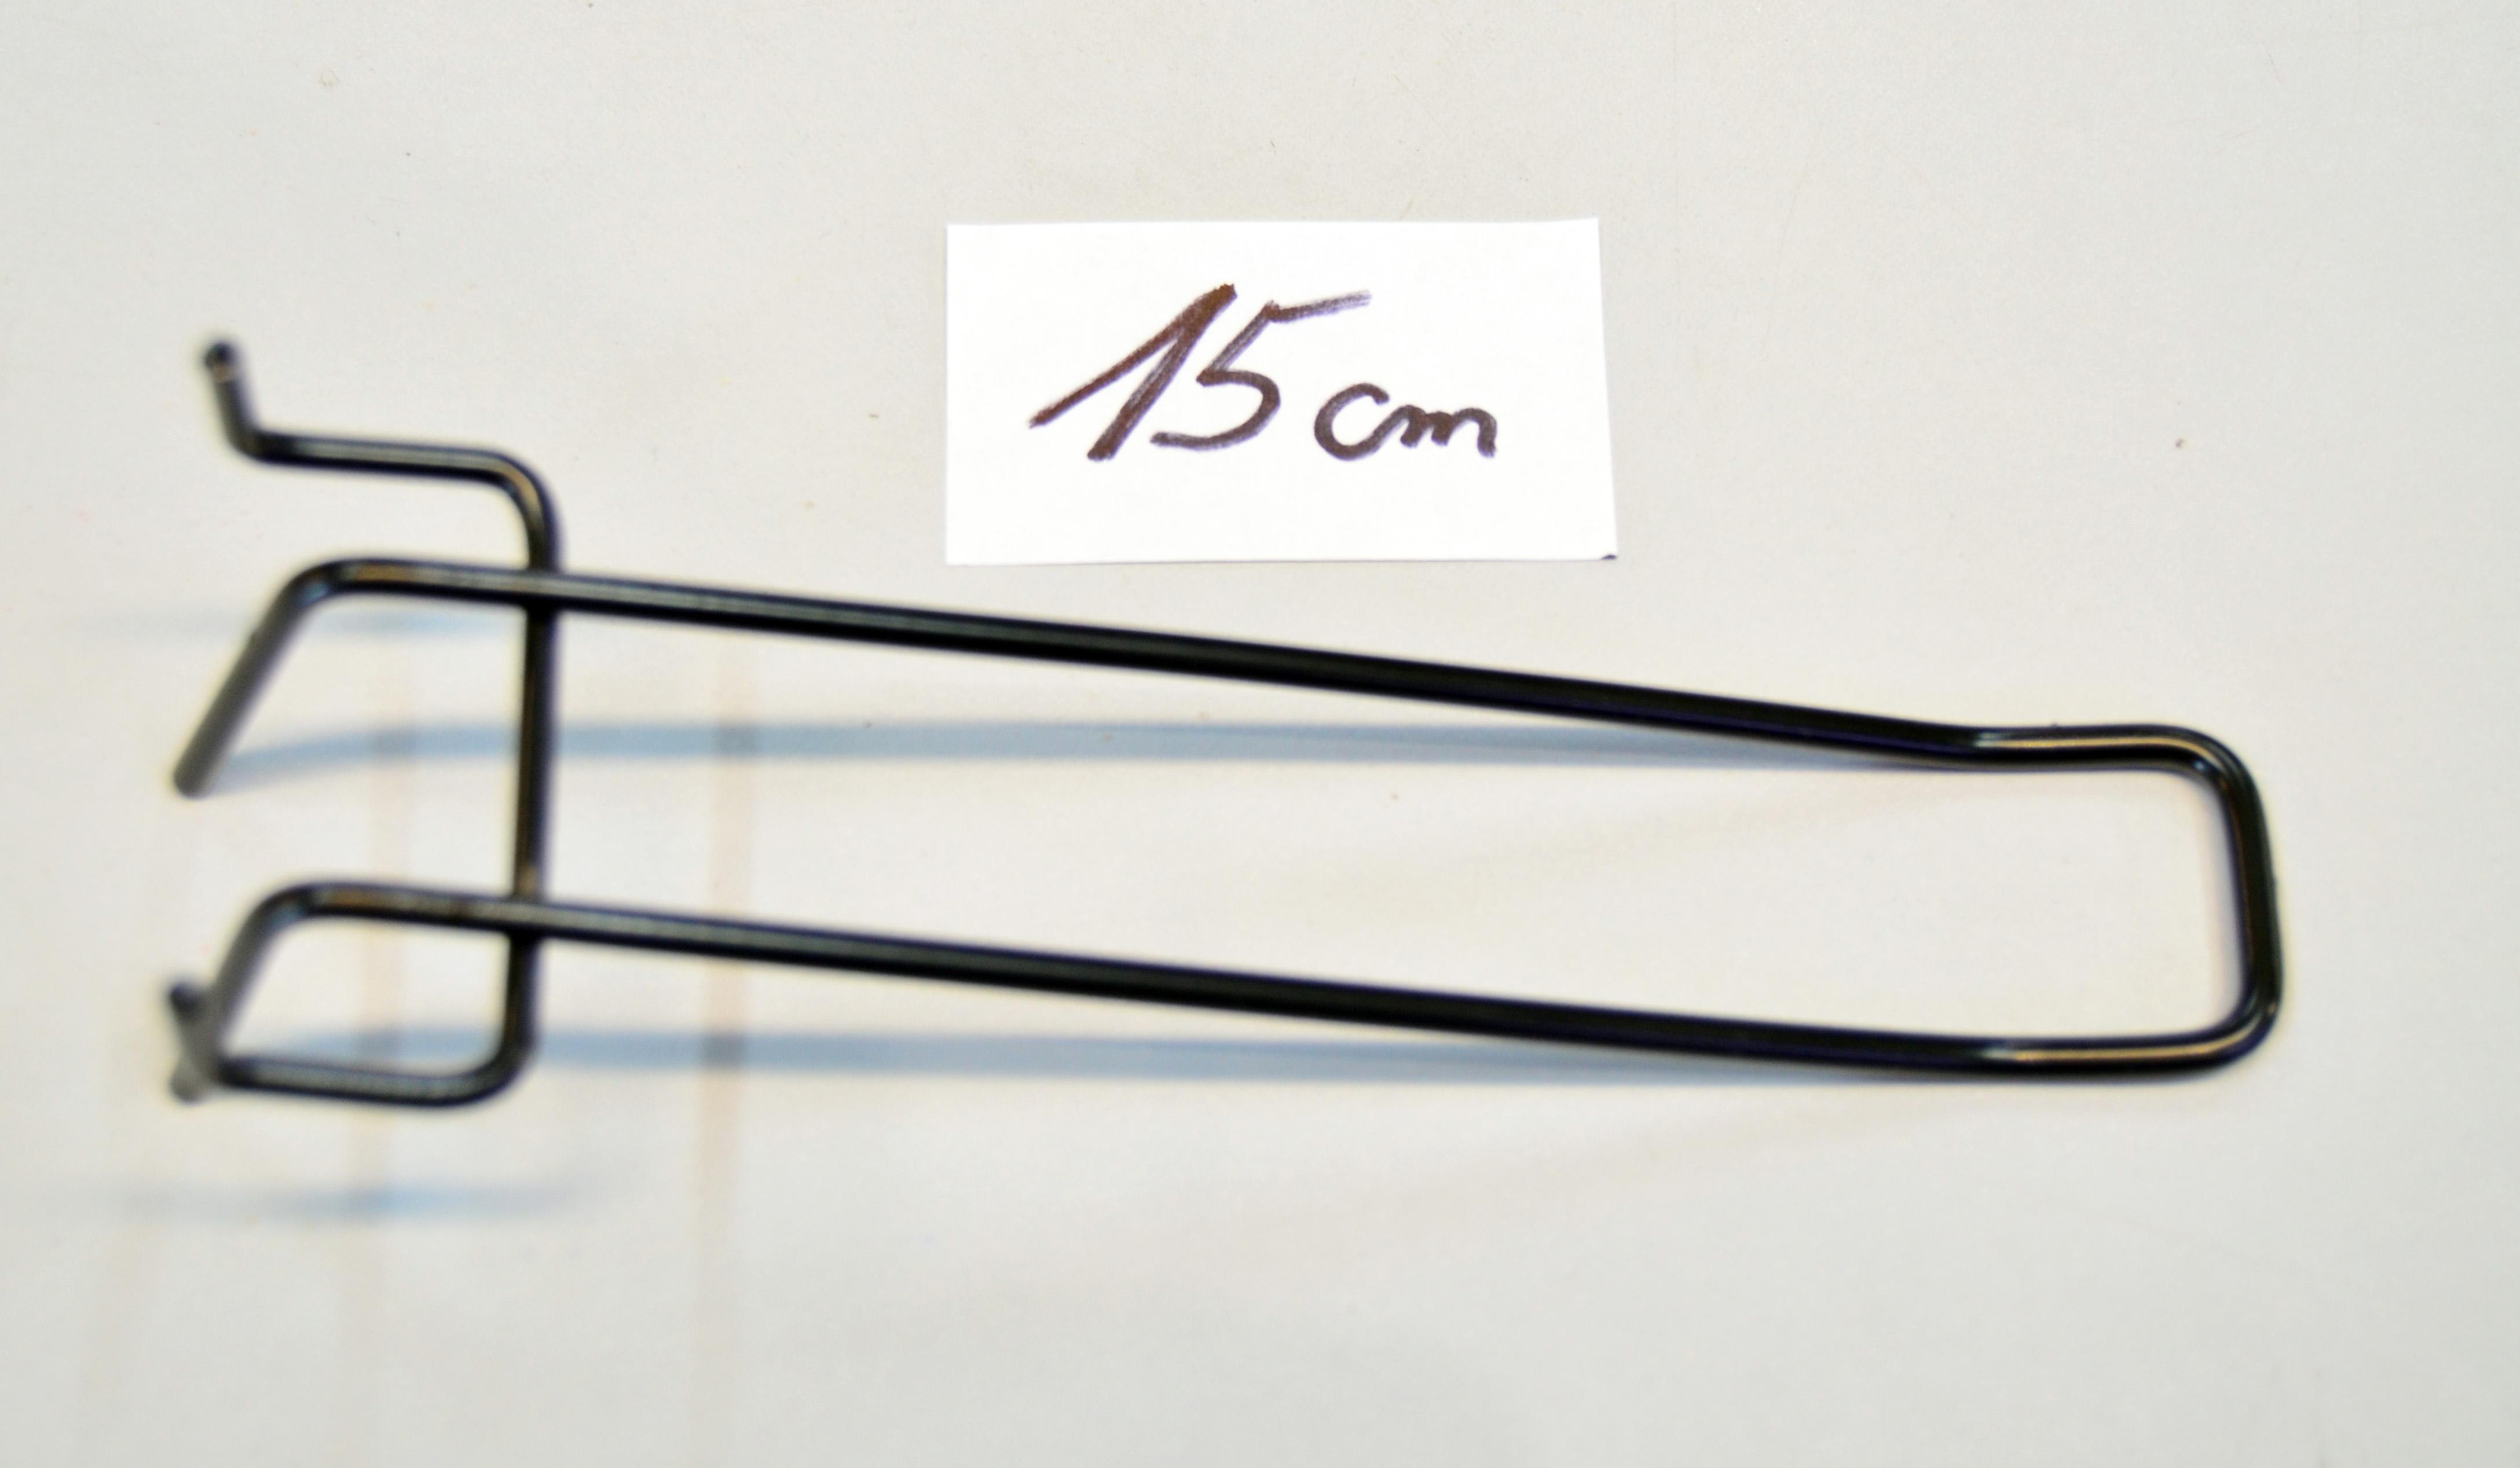 Háček kovový ke stojanu Mivardi Multi - 15cm